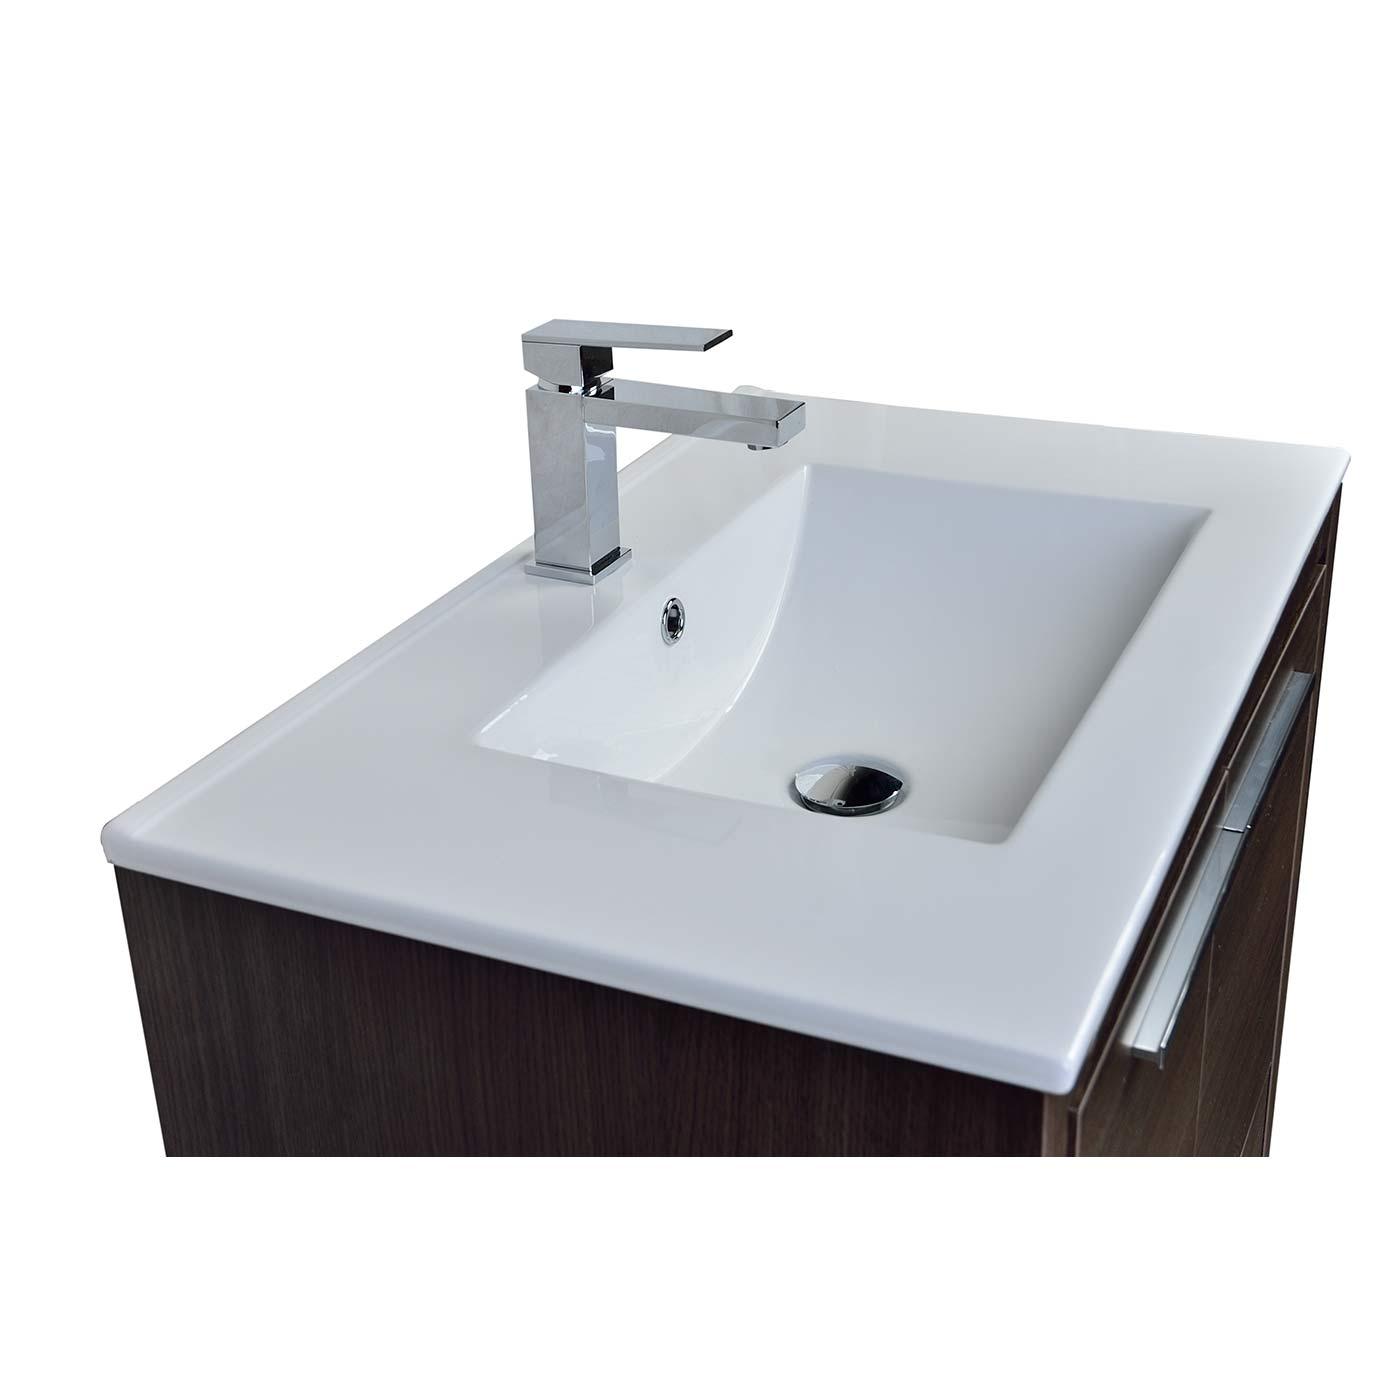 Buy Cbi Enna 29 5 Inch Grey Oak Modern Bathroom Vanity Tn La750 Go